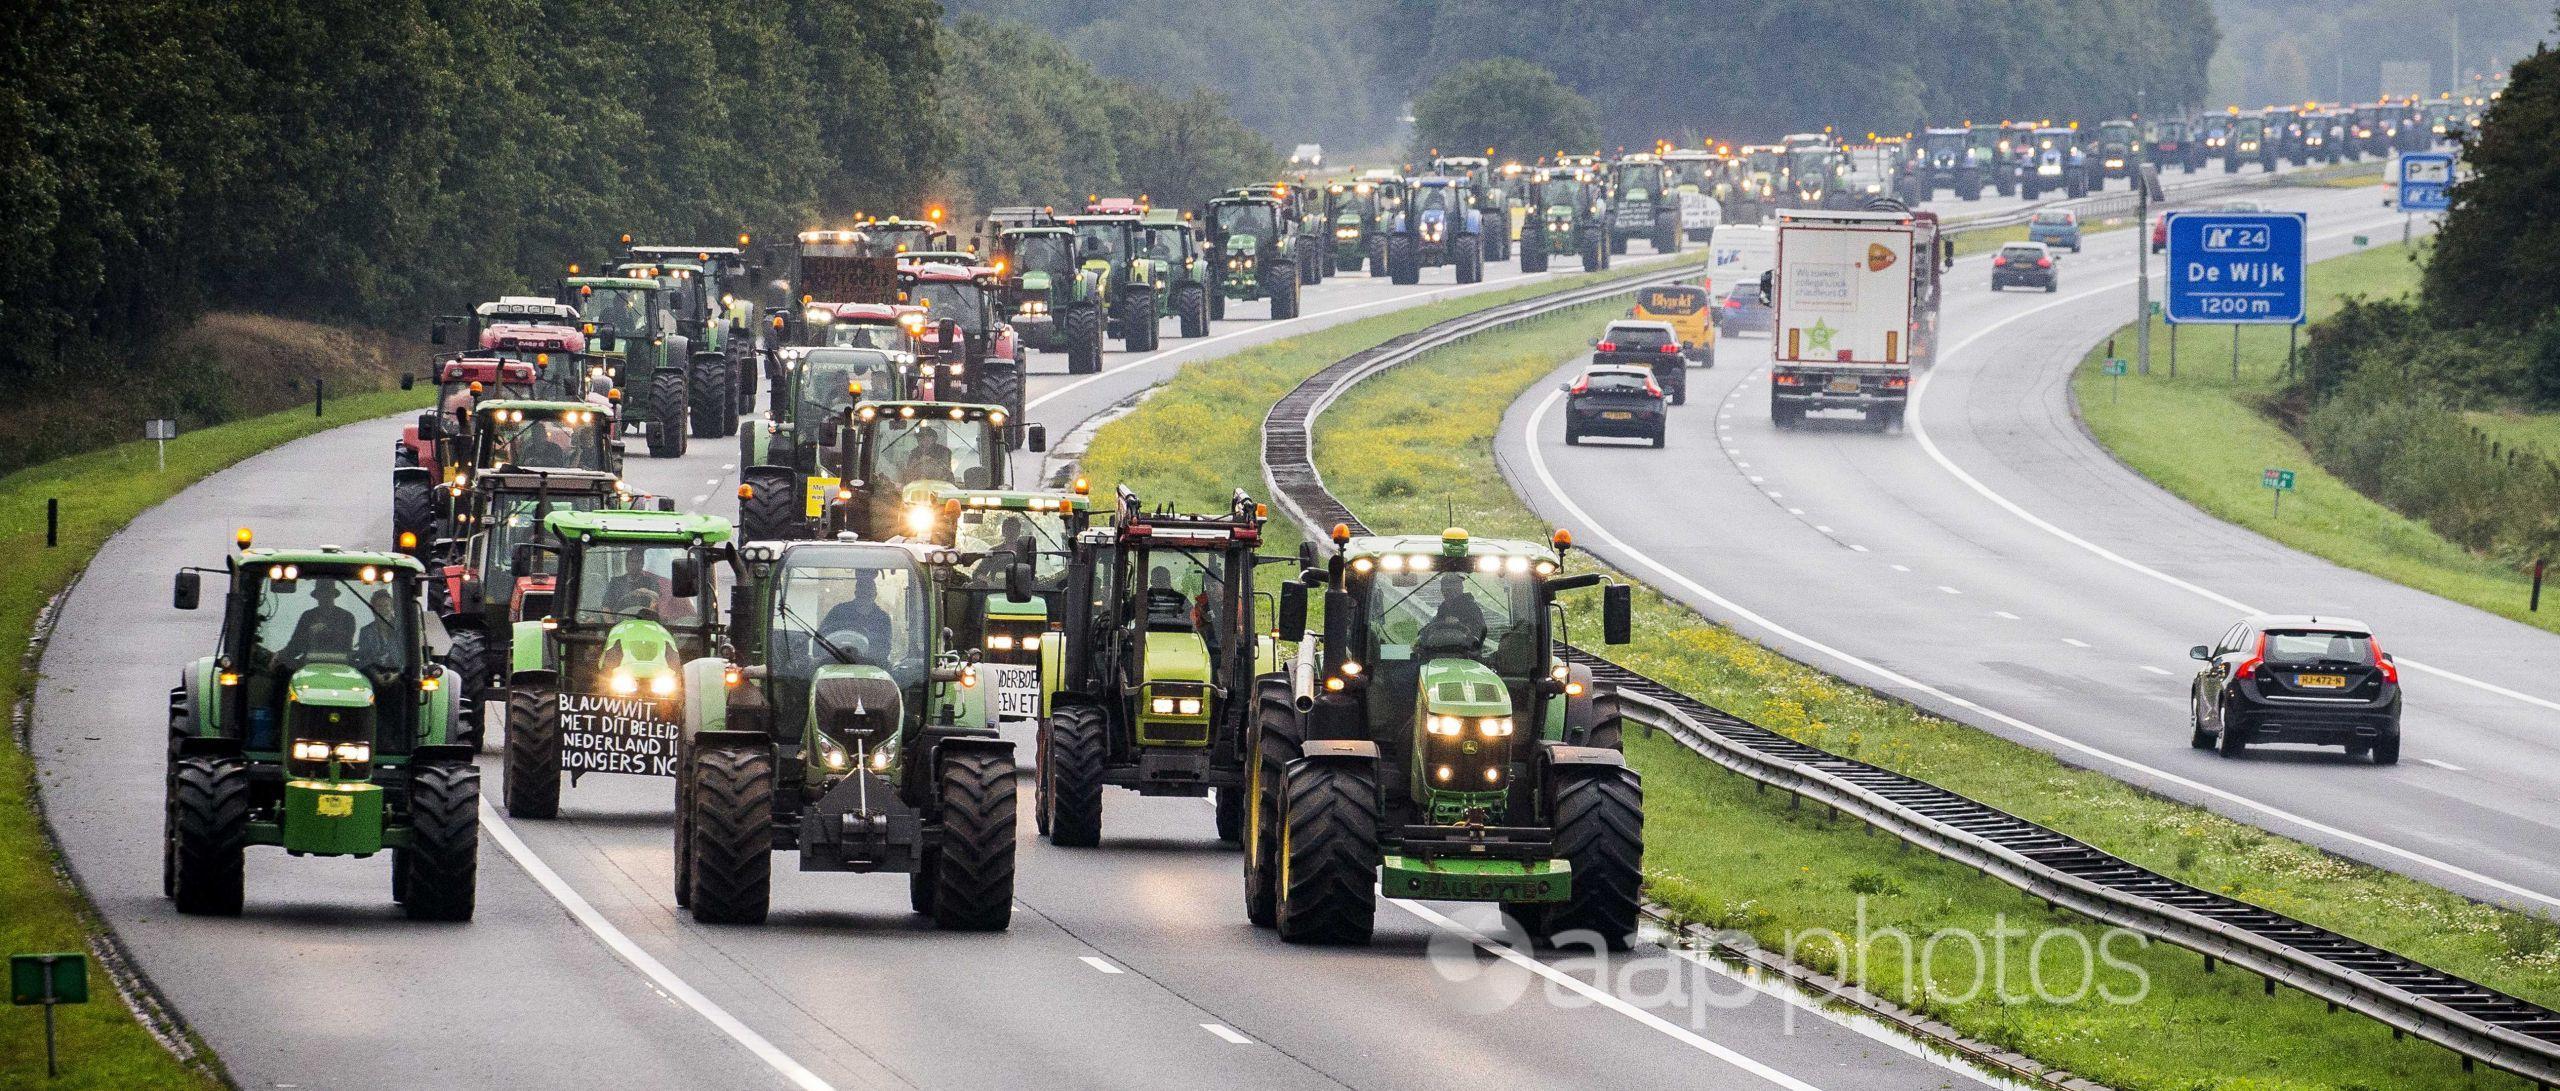 Farmers on their tractors between Hoogeveen and Meppel